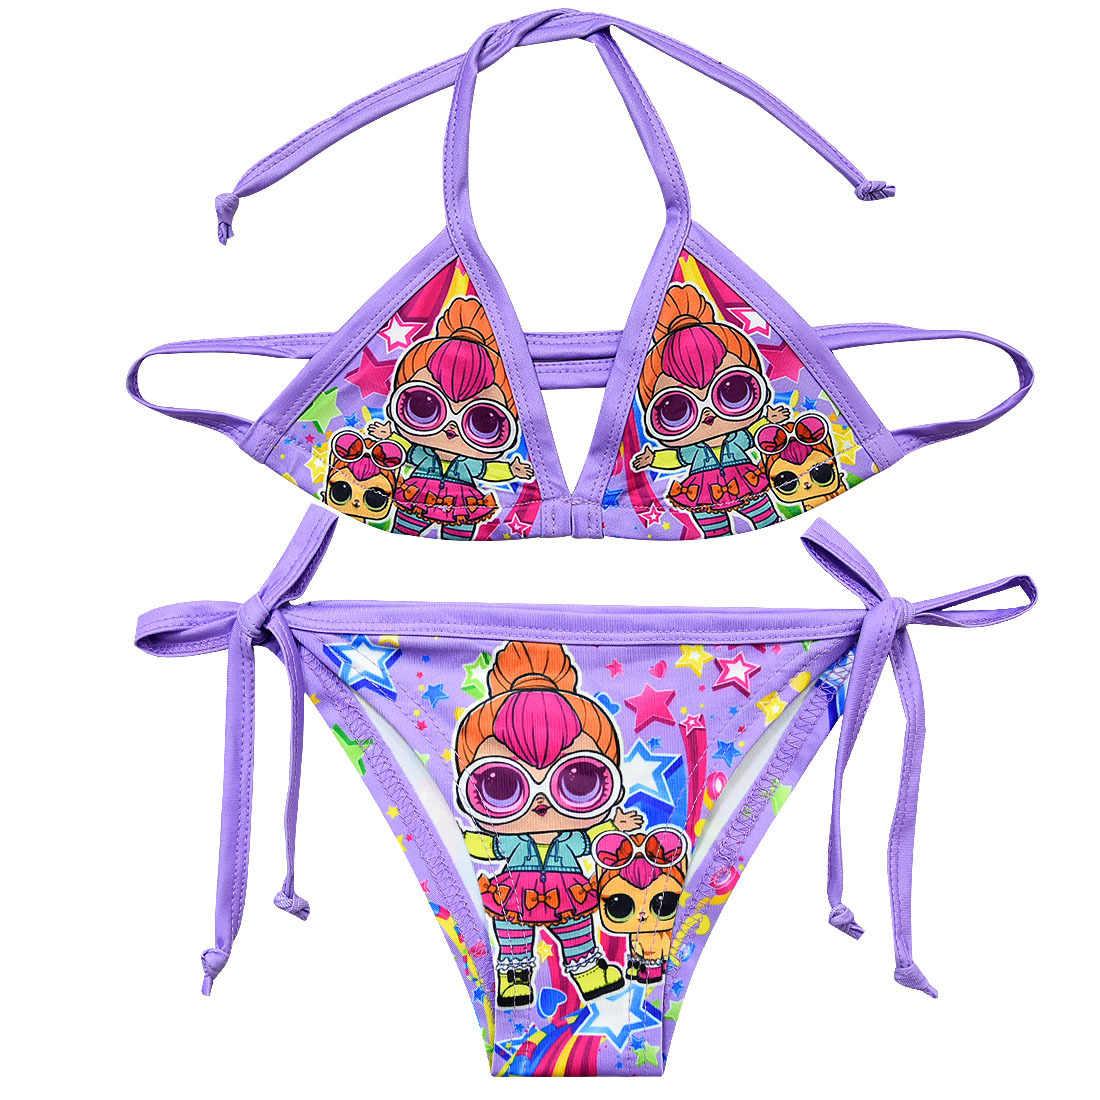 6949af6026 2019 Girls Swimsuit Two Piece 2-12 Years Children's Swimwear Infantil Girls  Bikini Suit 2019